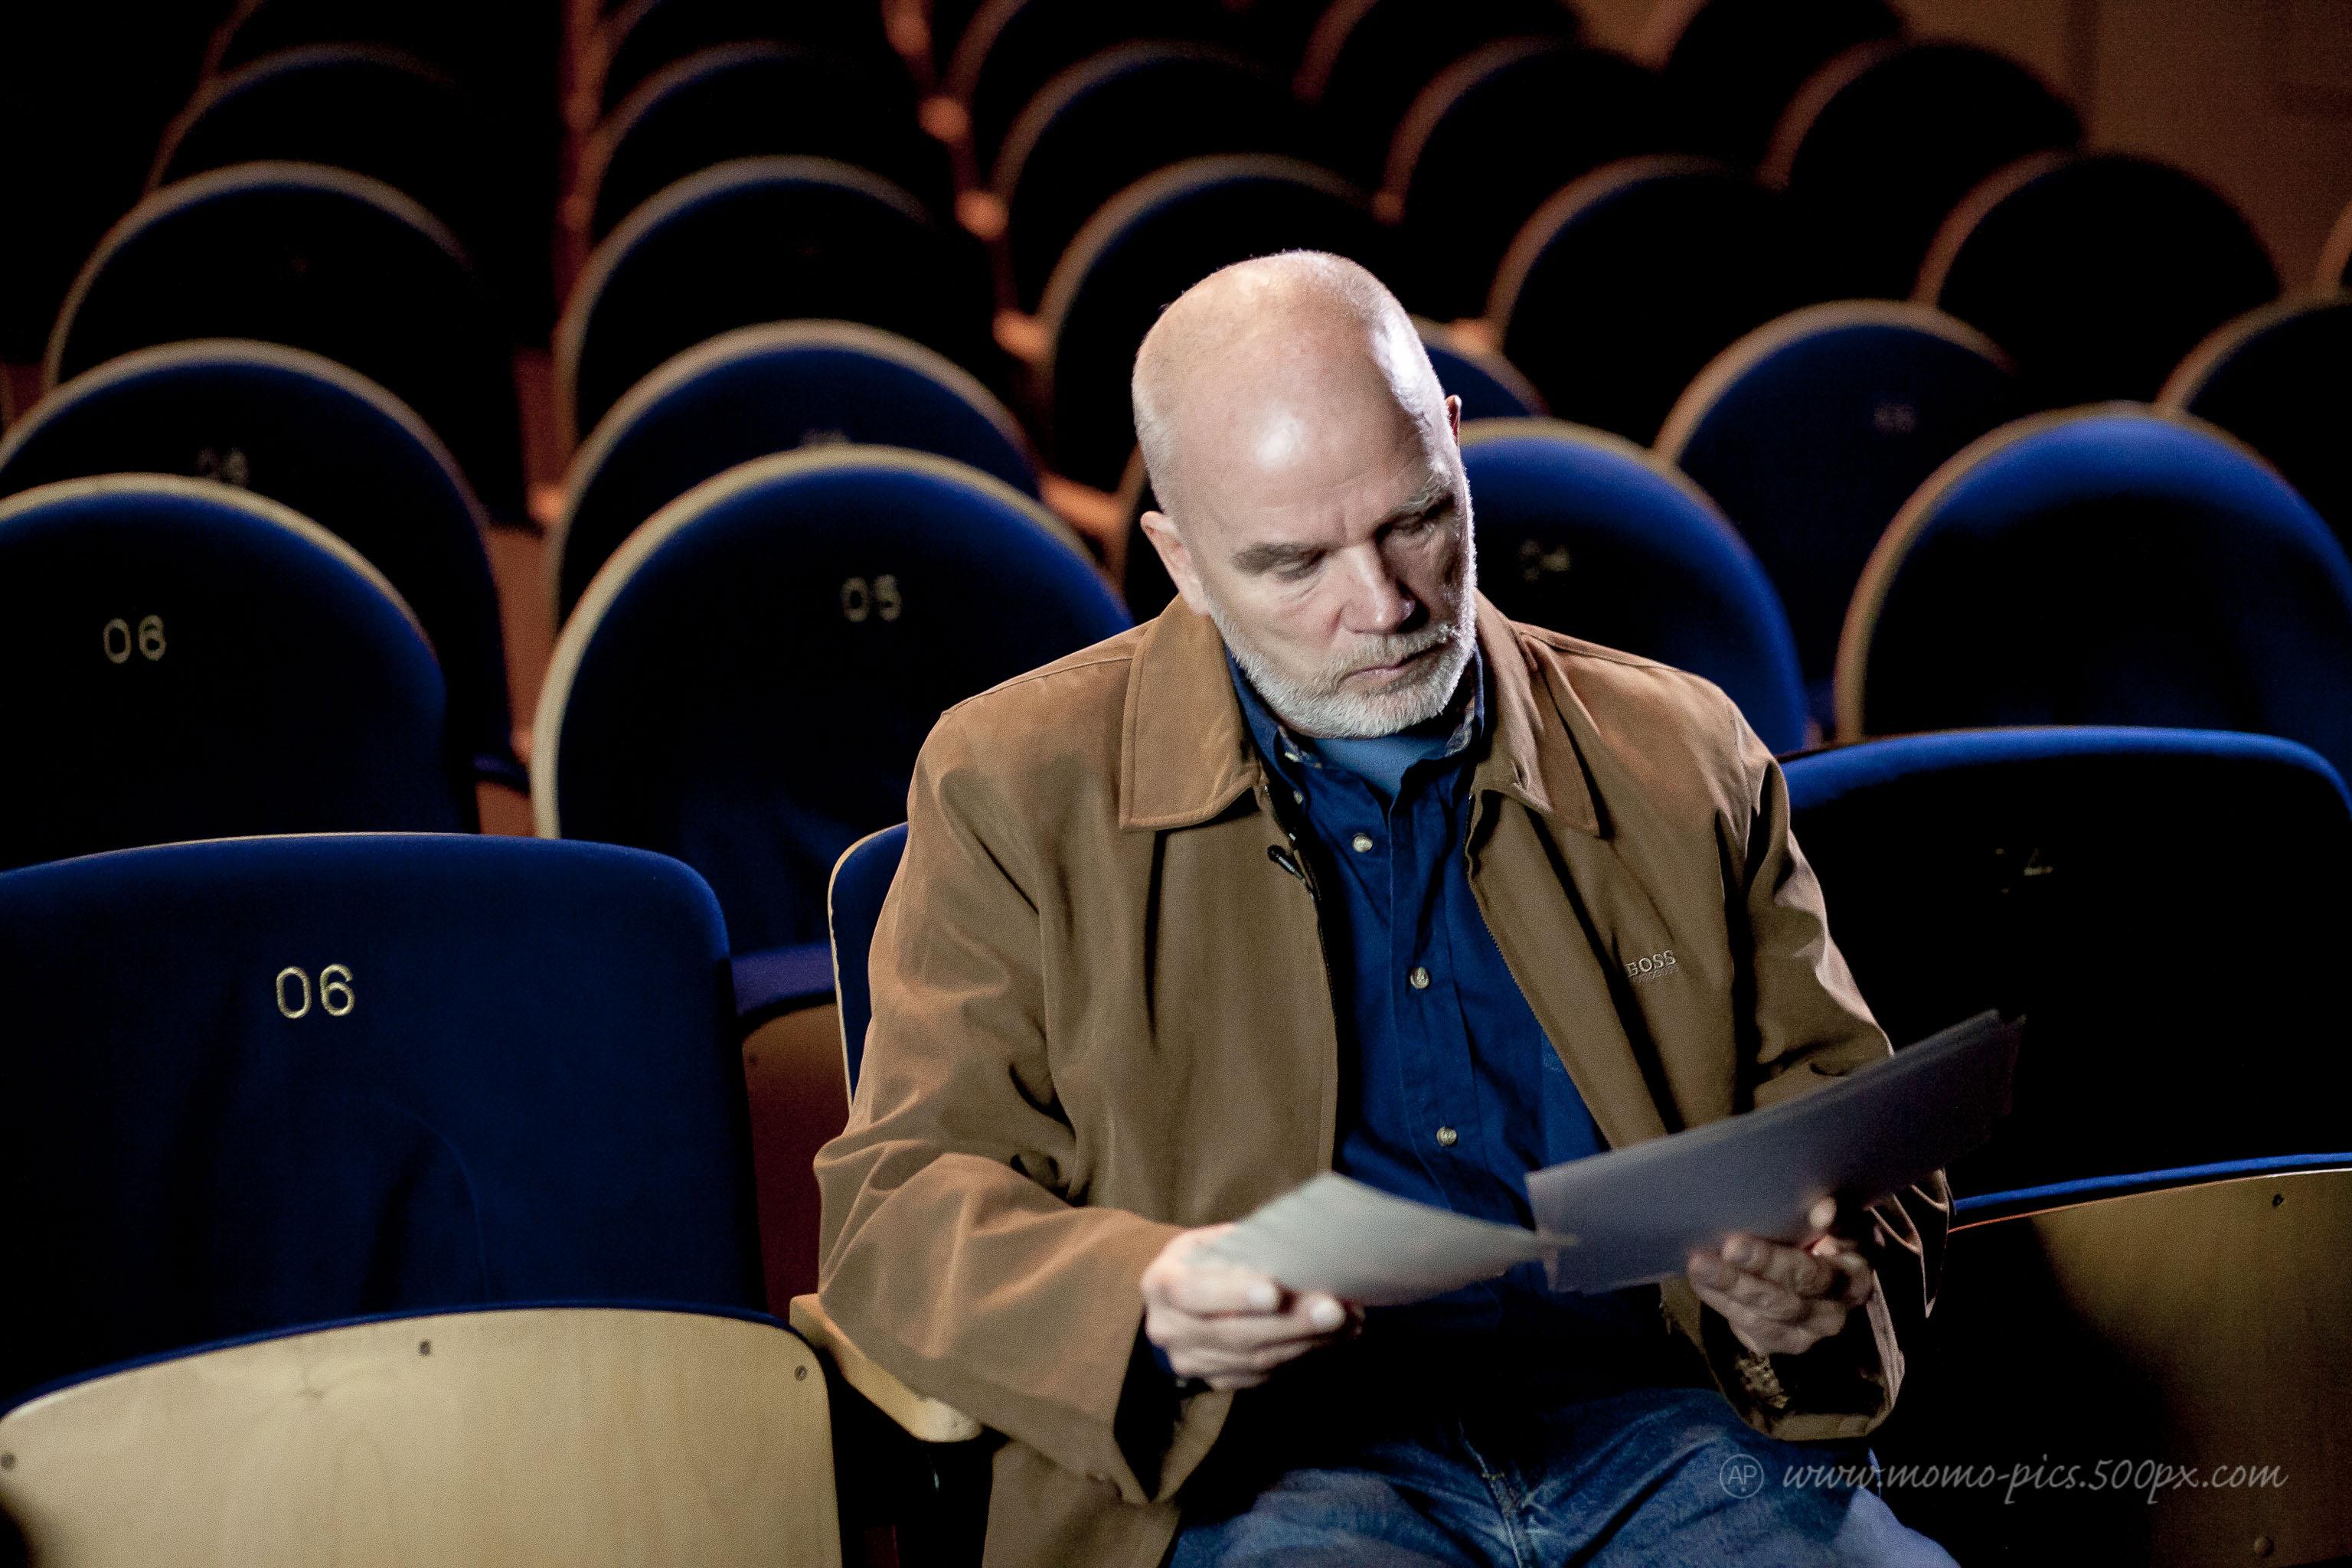 Roman Dziewoński